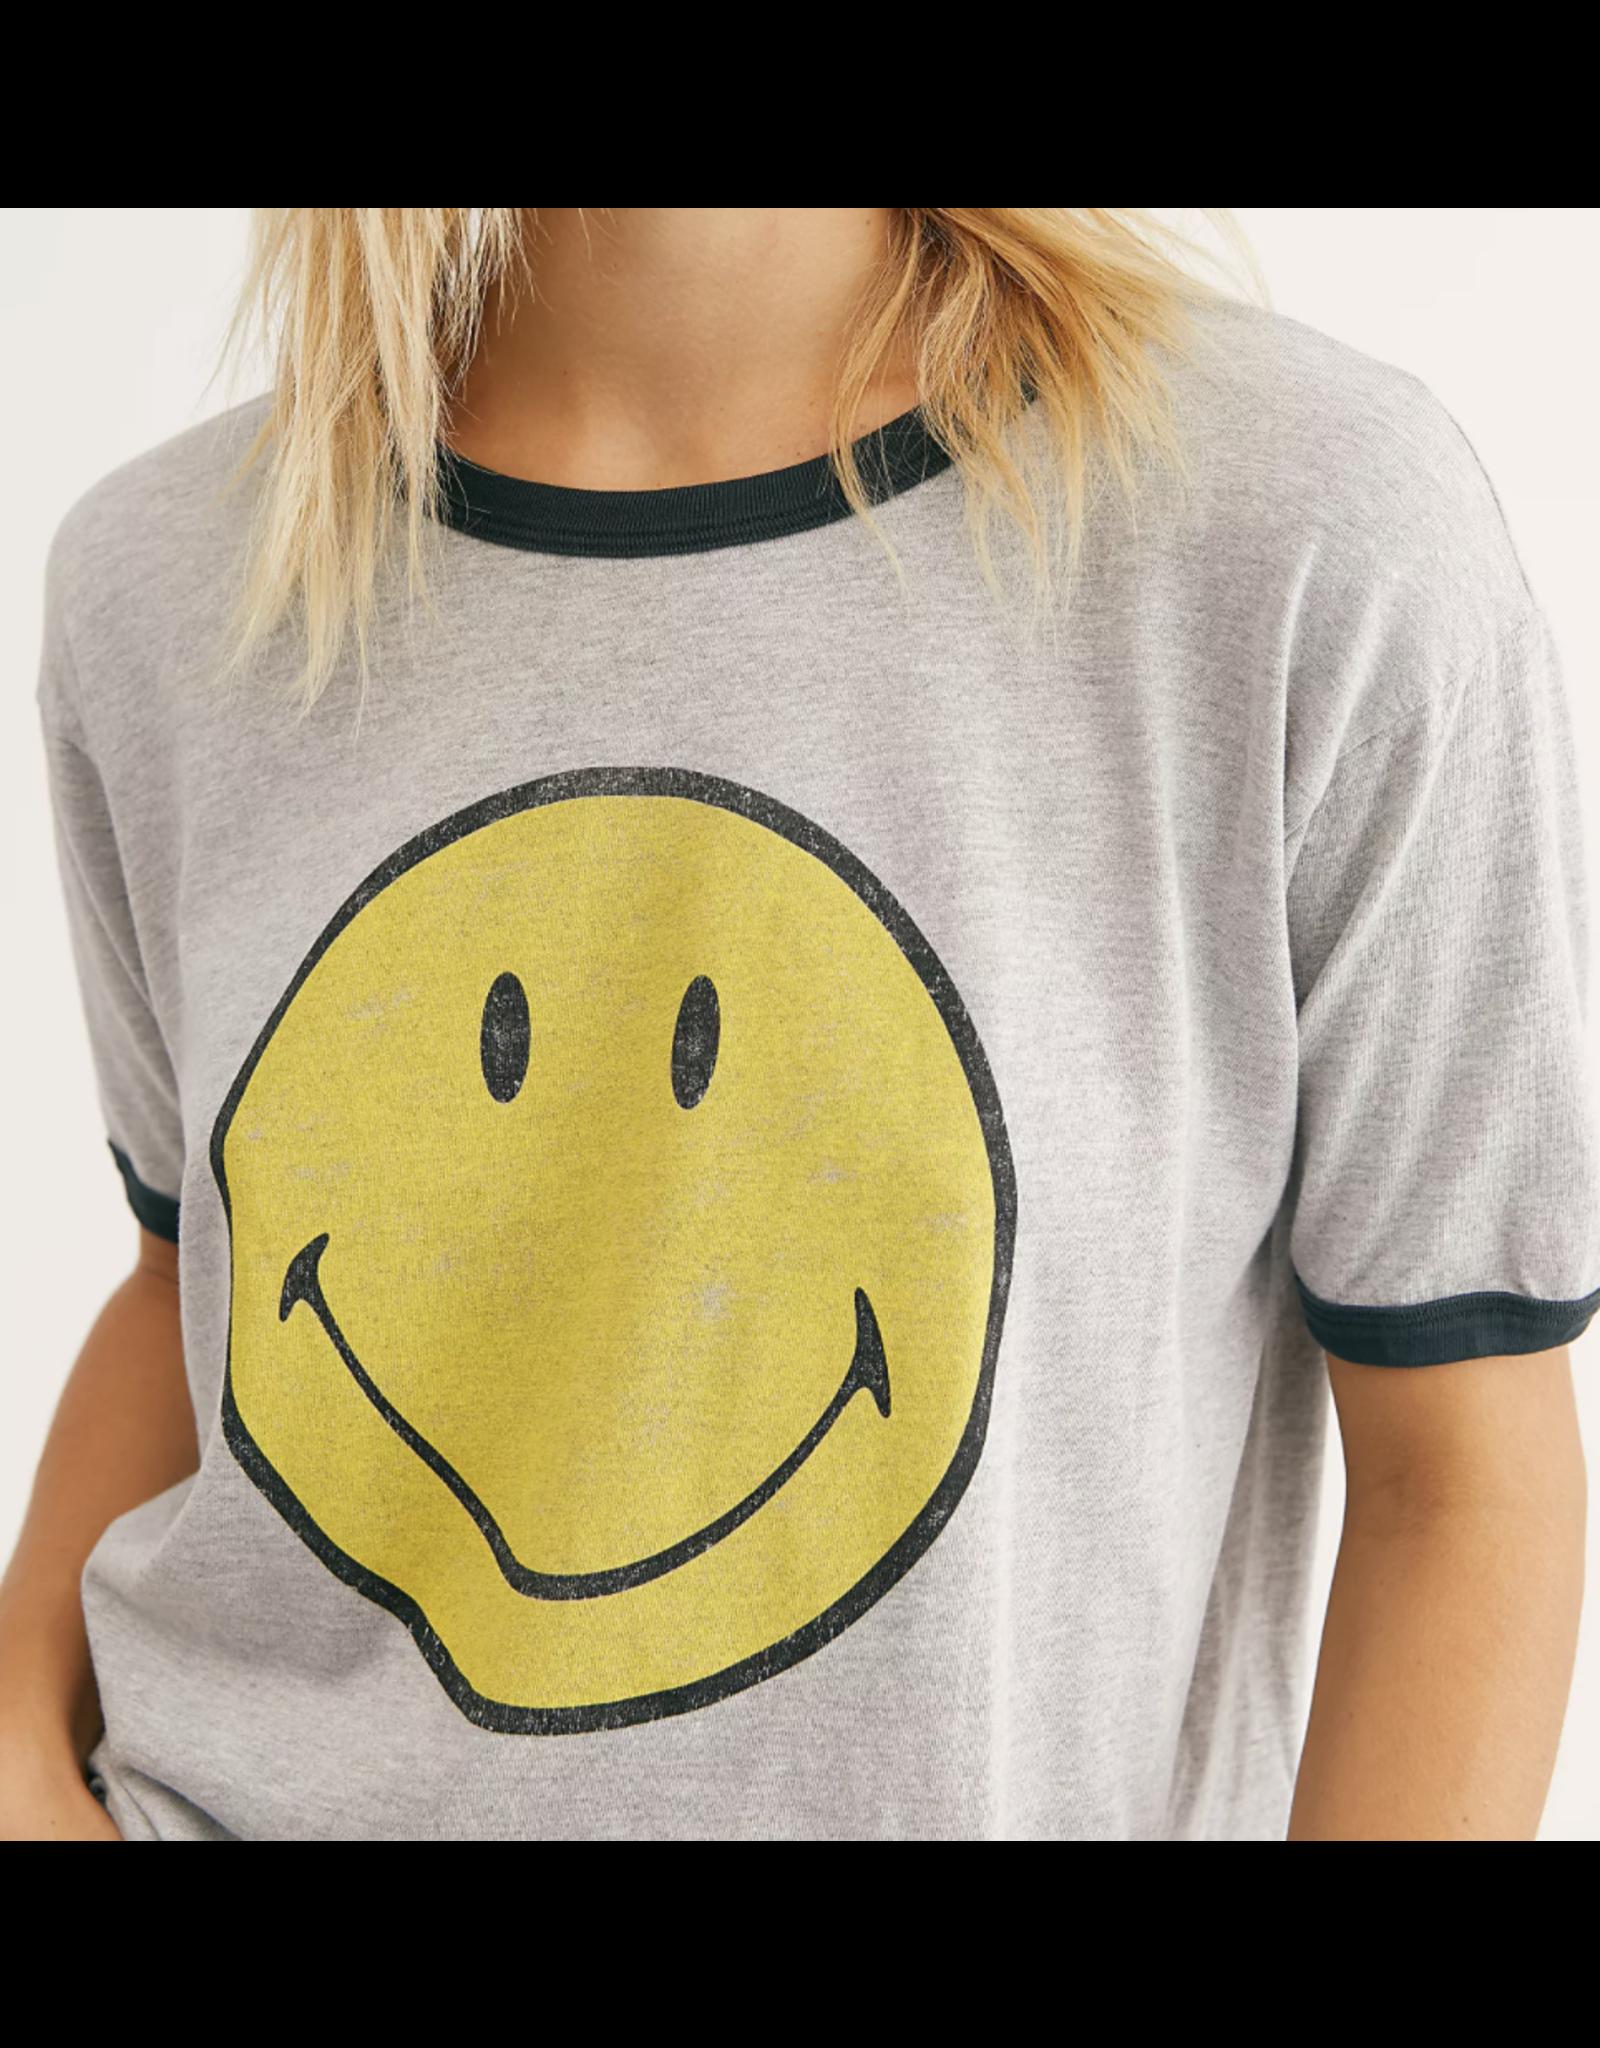 Daydreamer Daydreamer Smiley Tee